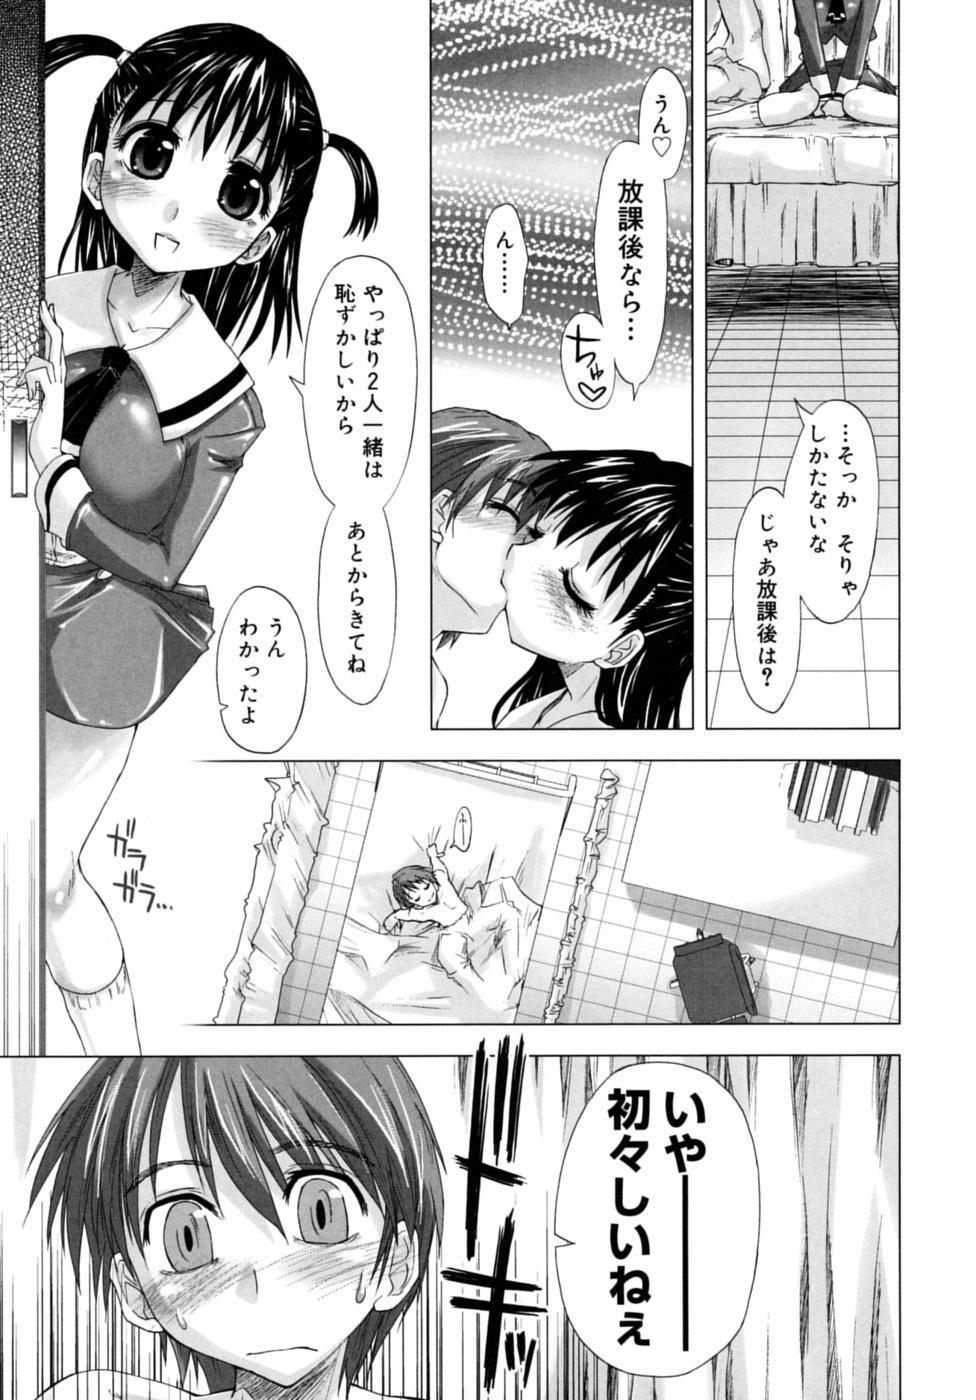 Houkago Shoujo - After School Girls 12